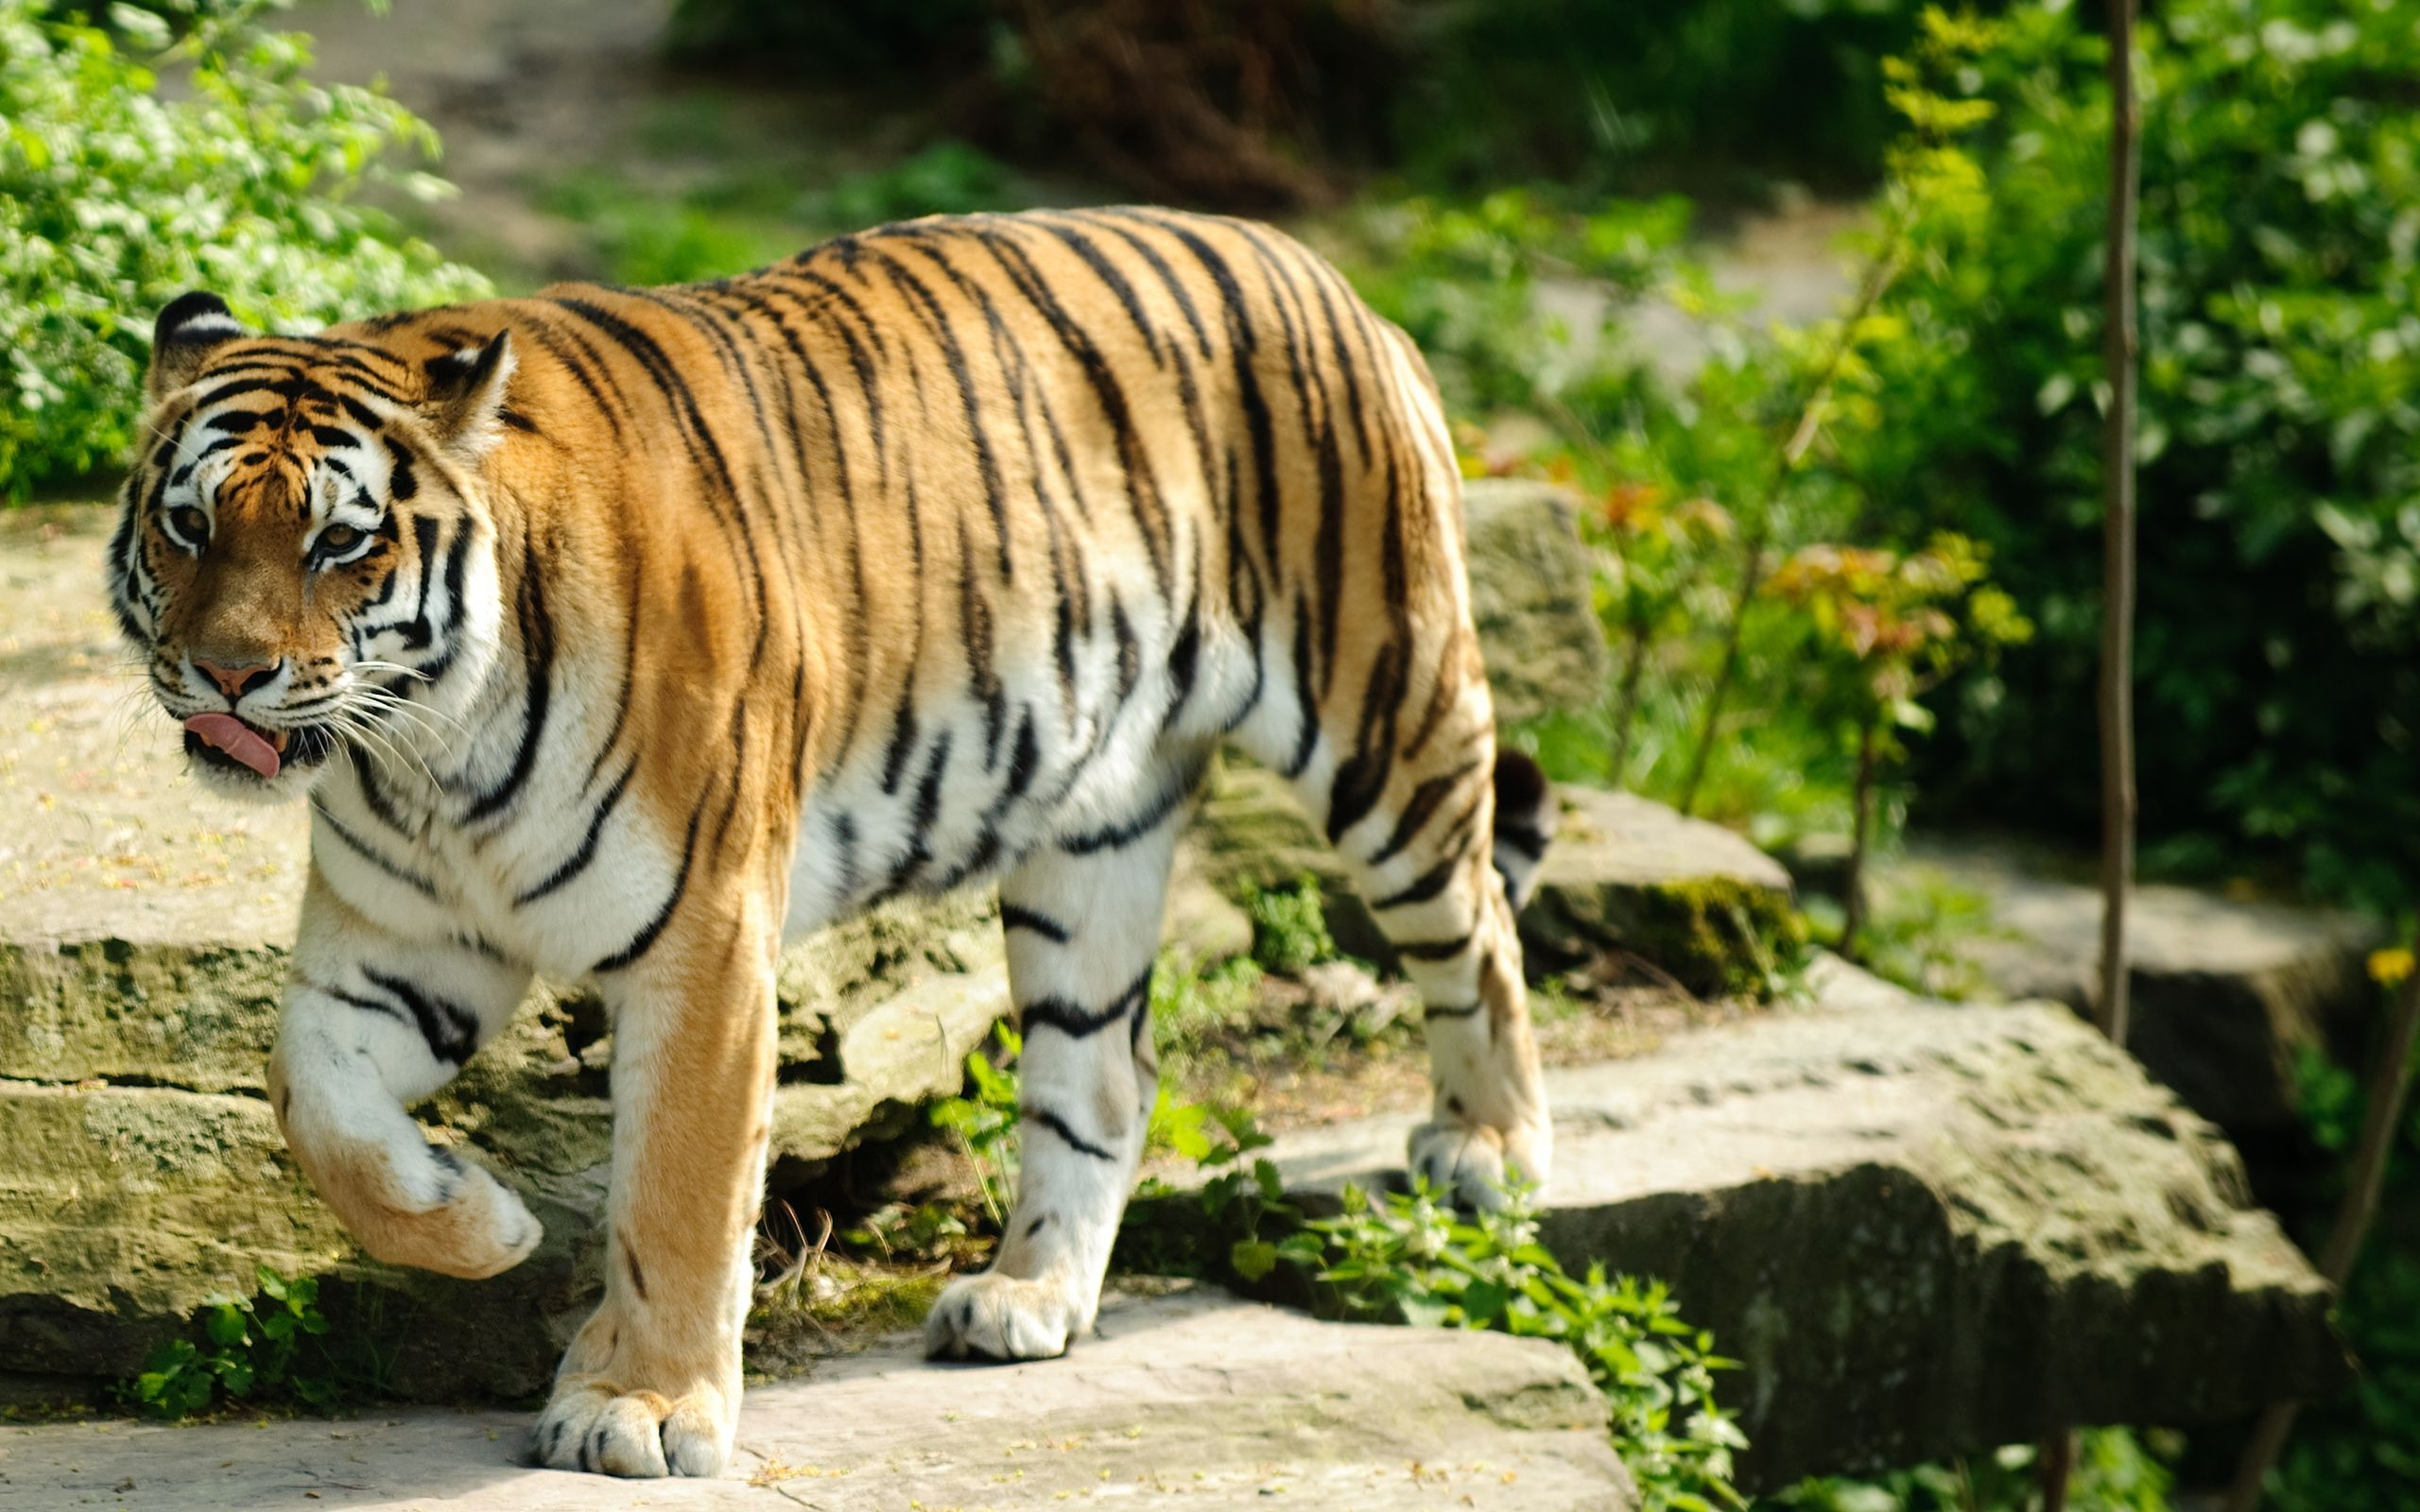 Best Tiger High Definition Wallpaper Tiger Wallpaper Pet Tiger Animal Wallpaper